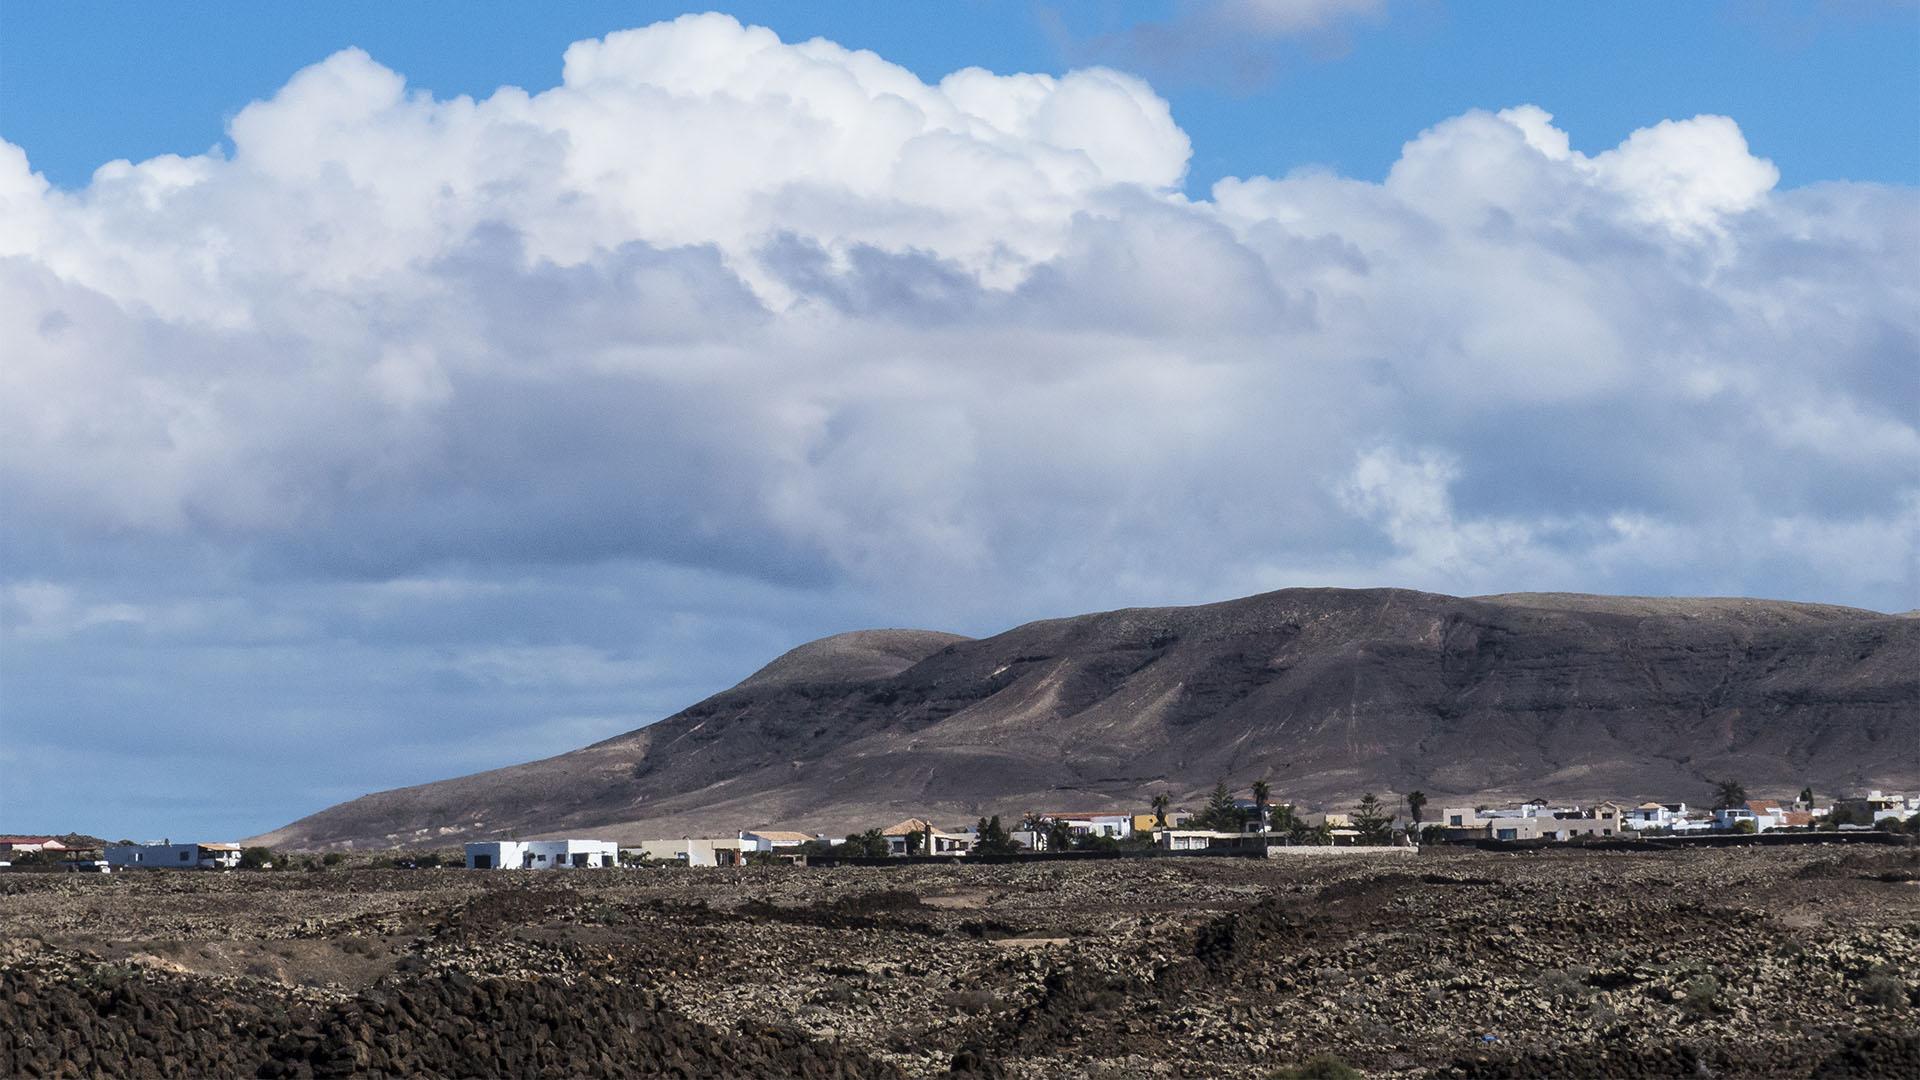 Der Ort El Roque Fuerteventura.